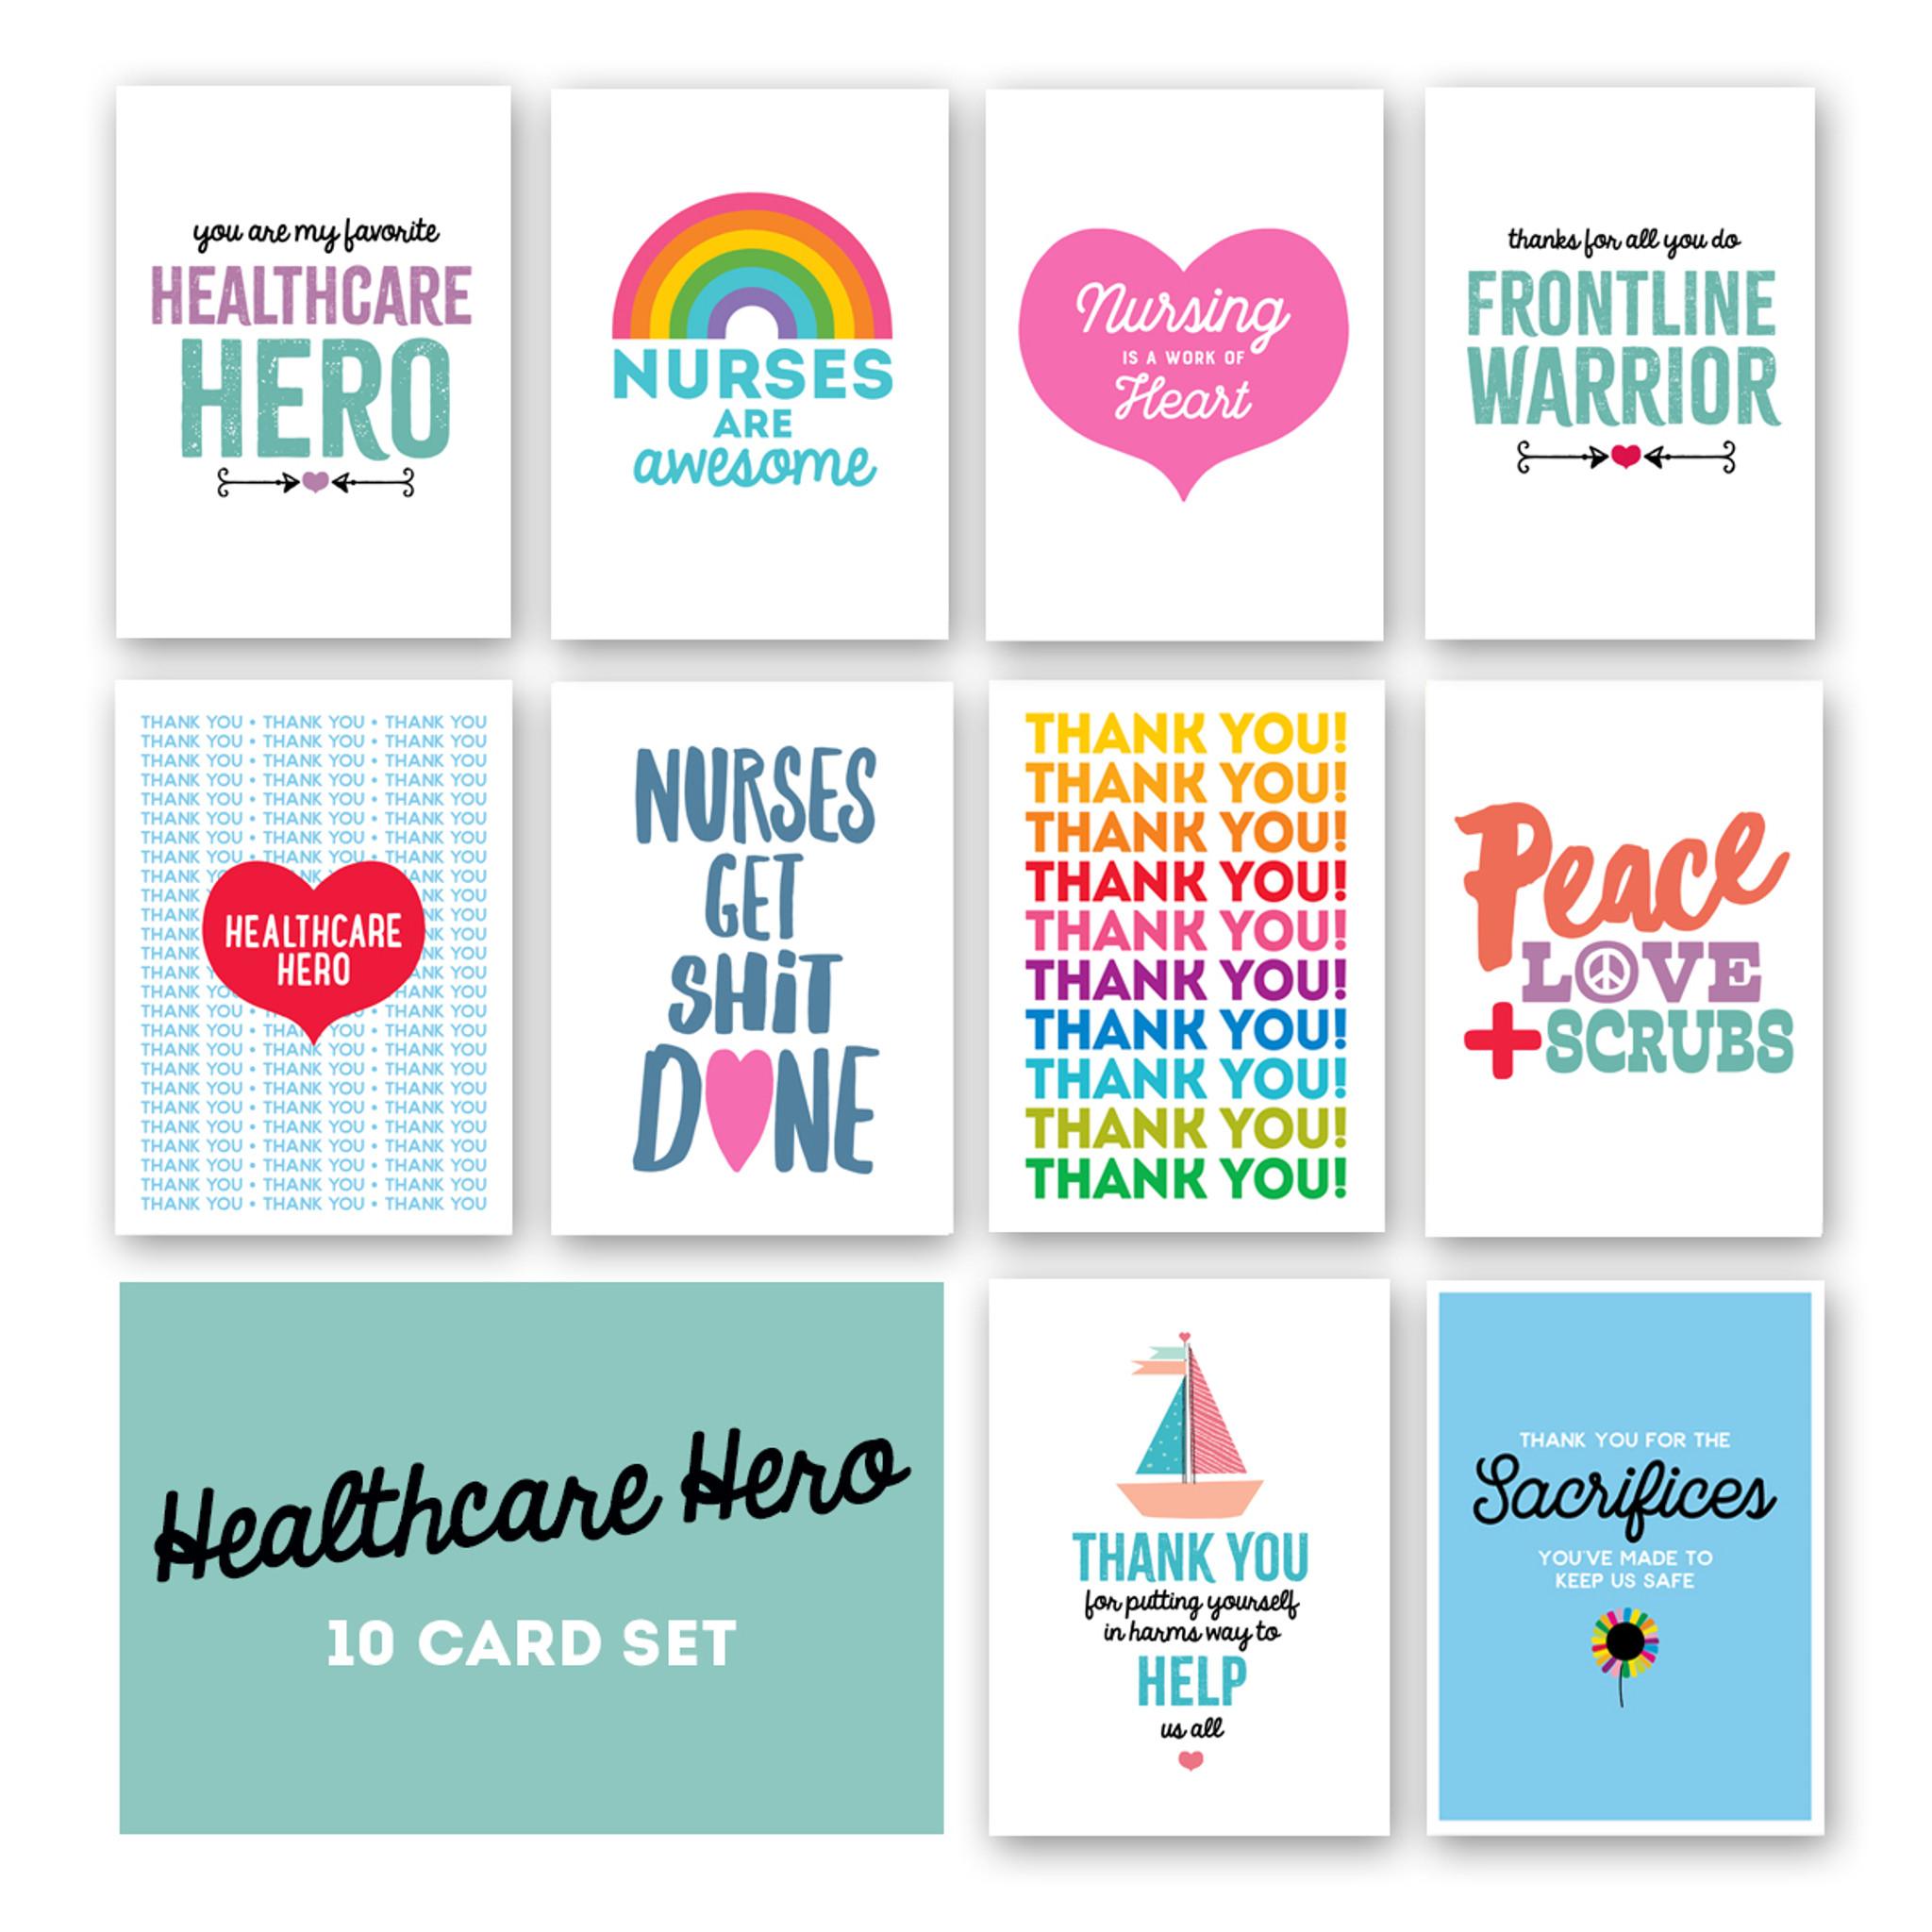 Healthcare Hero 10 card set